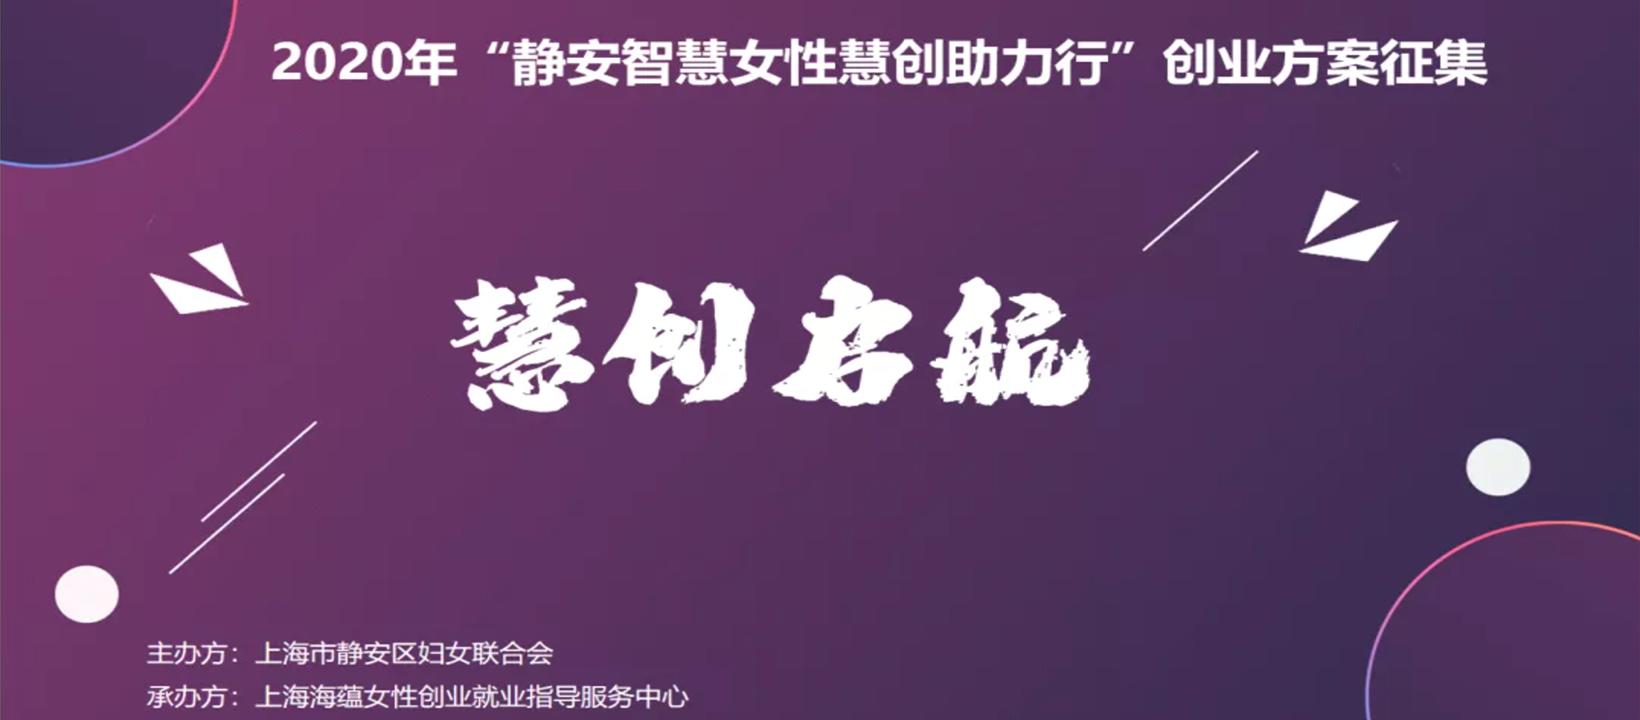 benner3副本